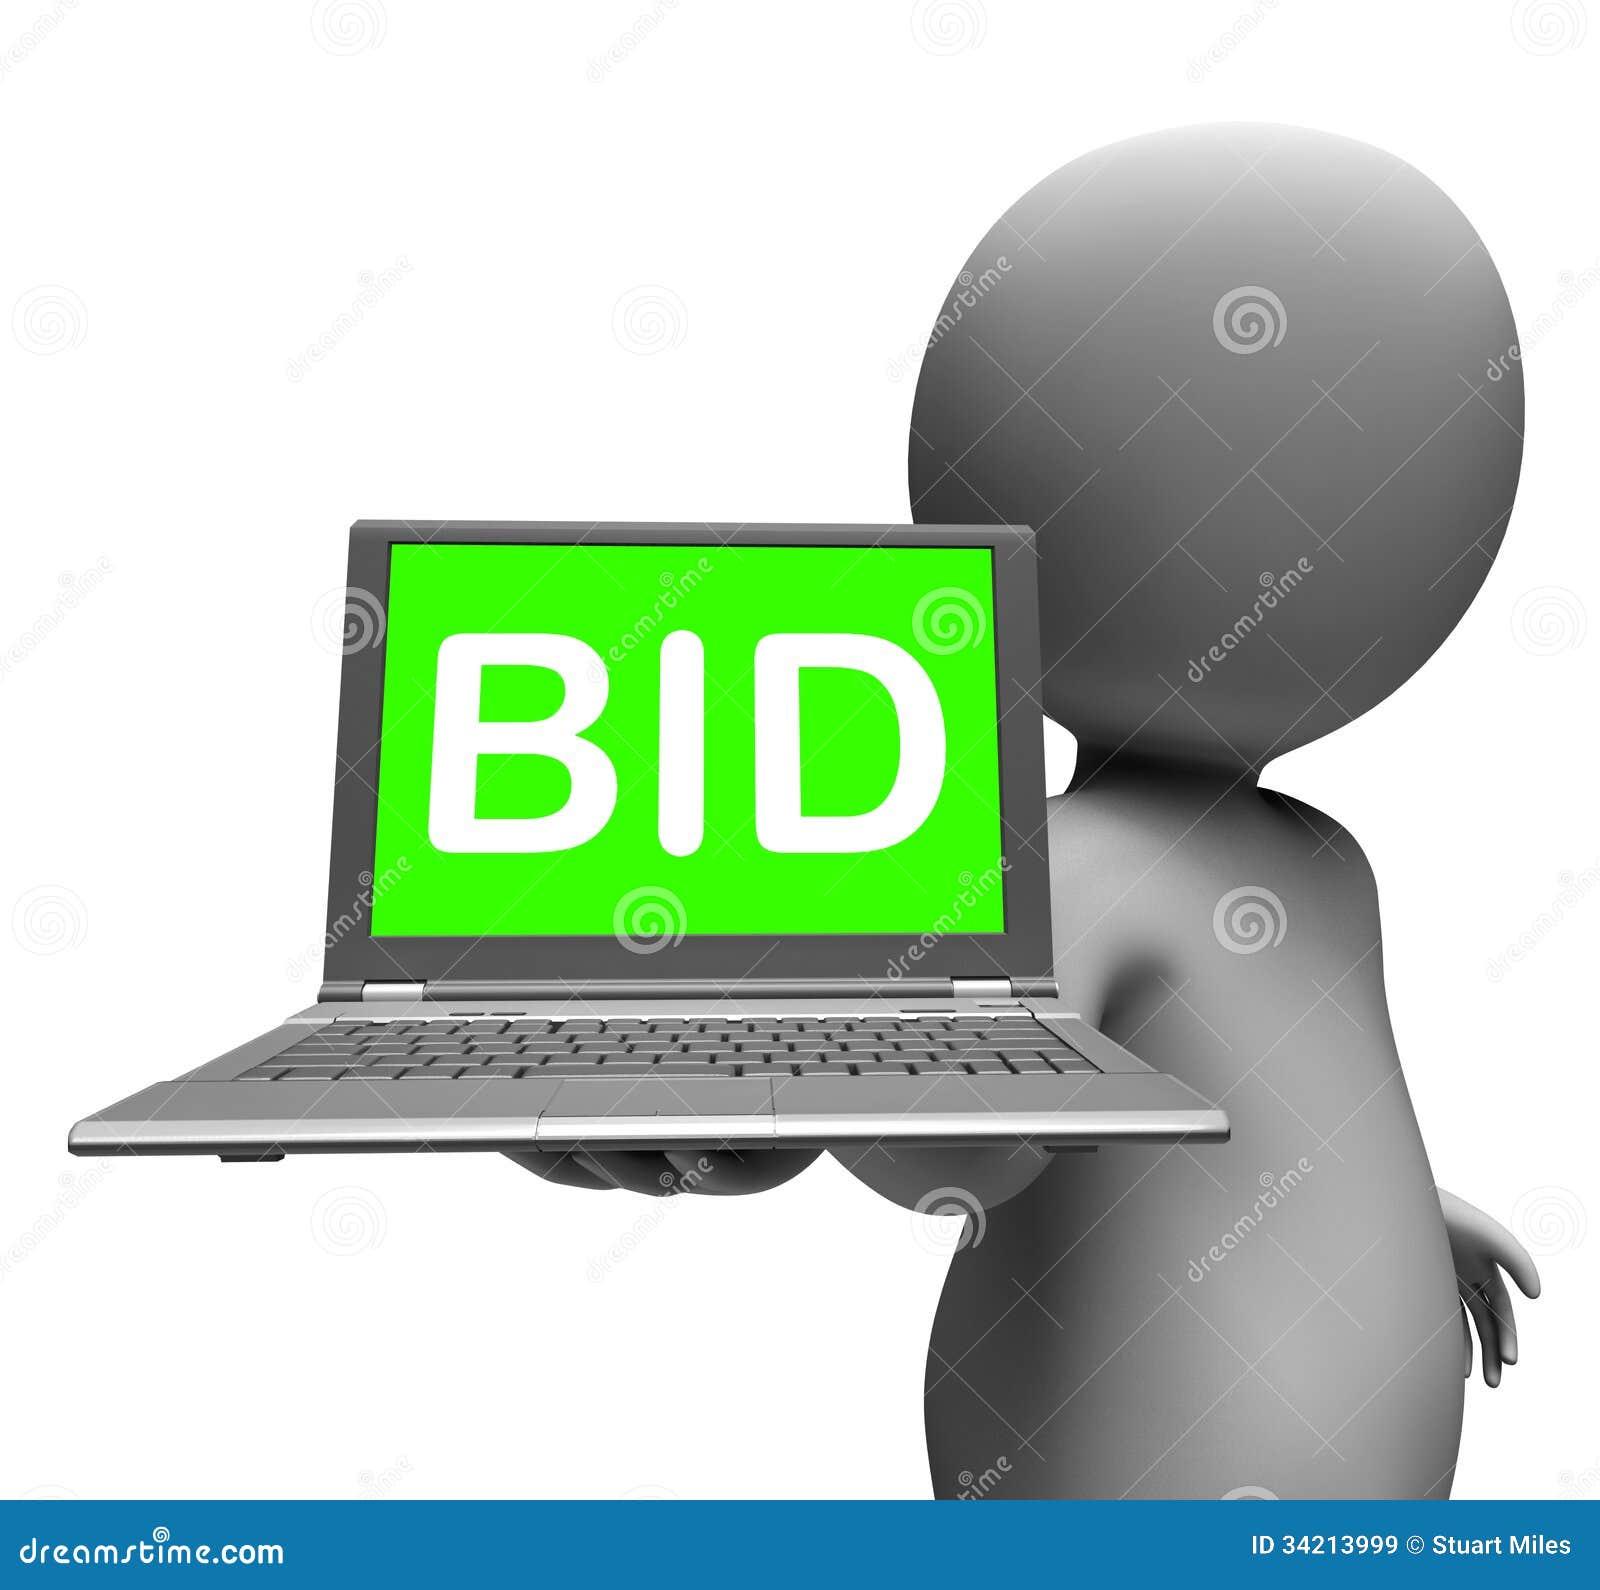 Bid Laptop Character Shows Bids Bidding Or Auction Online